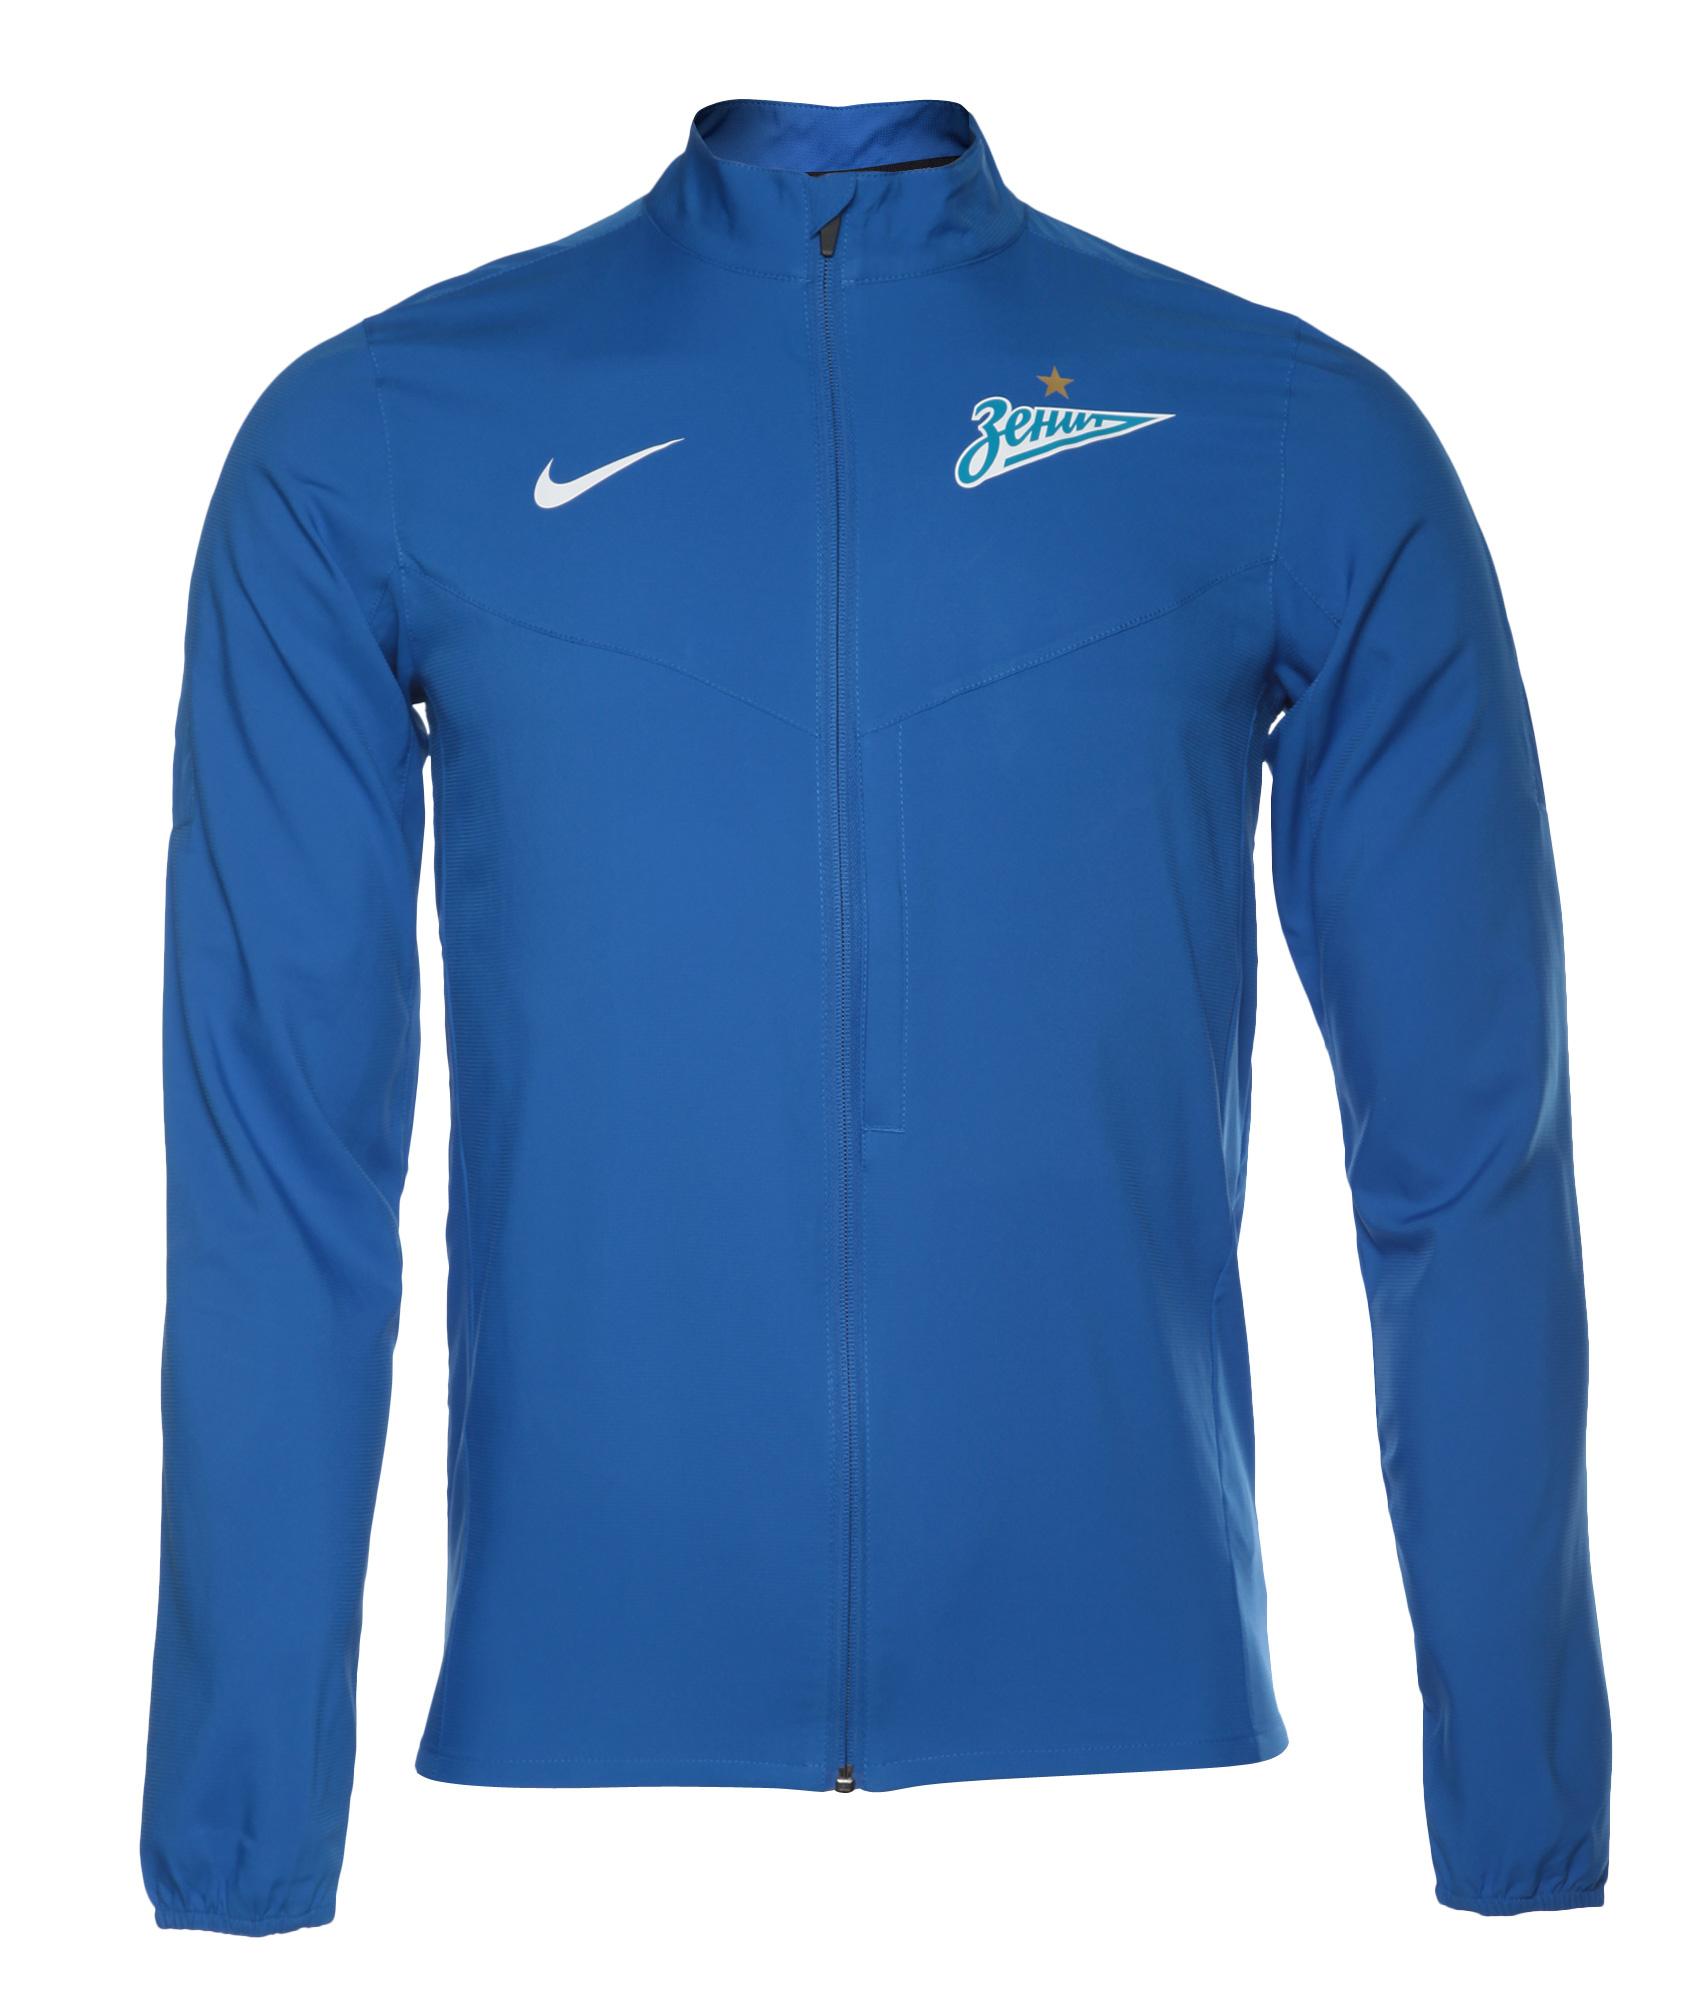 Ветровка Nike, Цвет-Синий, Размер-L ветровка penny eleven pe 1602 синий l